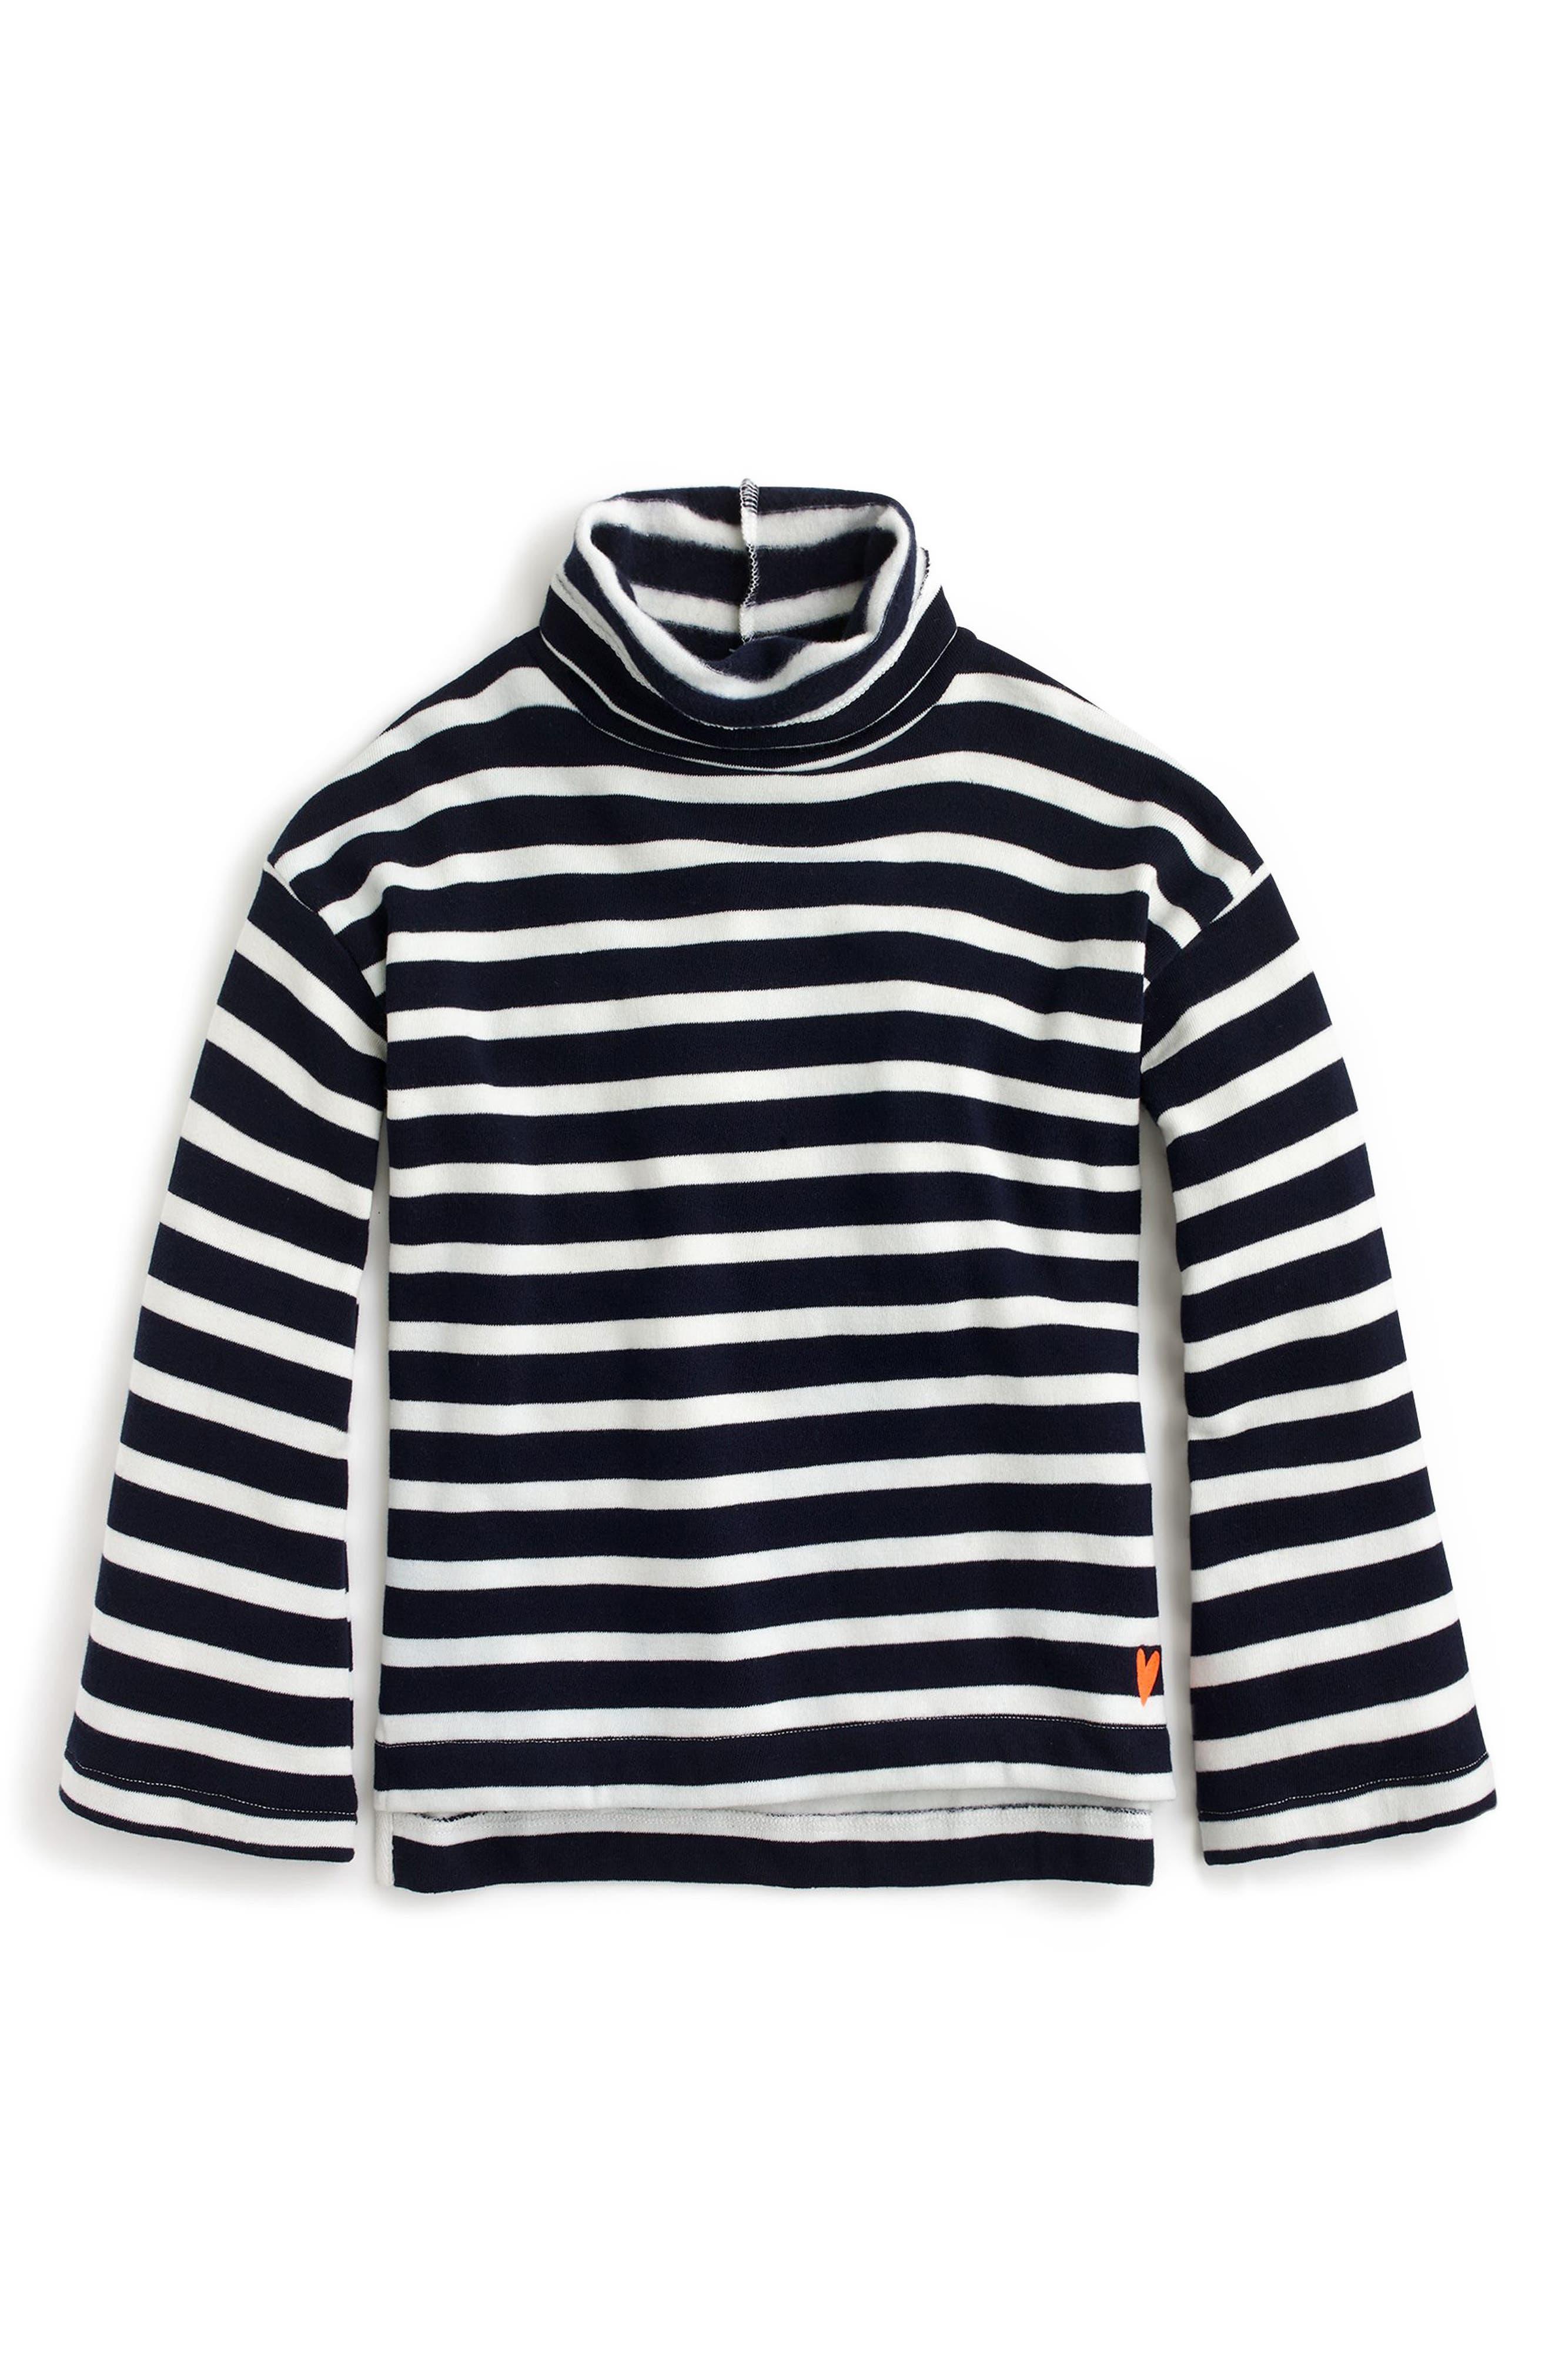 Stripe Drop Shoulder Turtleneck,                             Main thumbnail 1, color,                             Navy/ Ivory